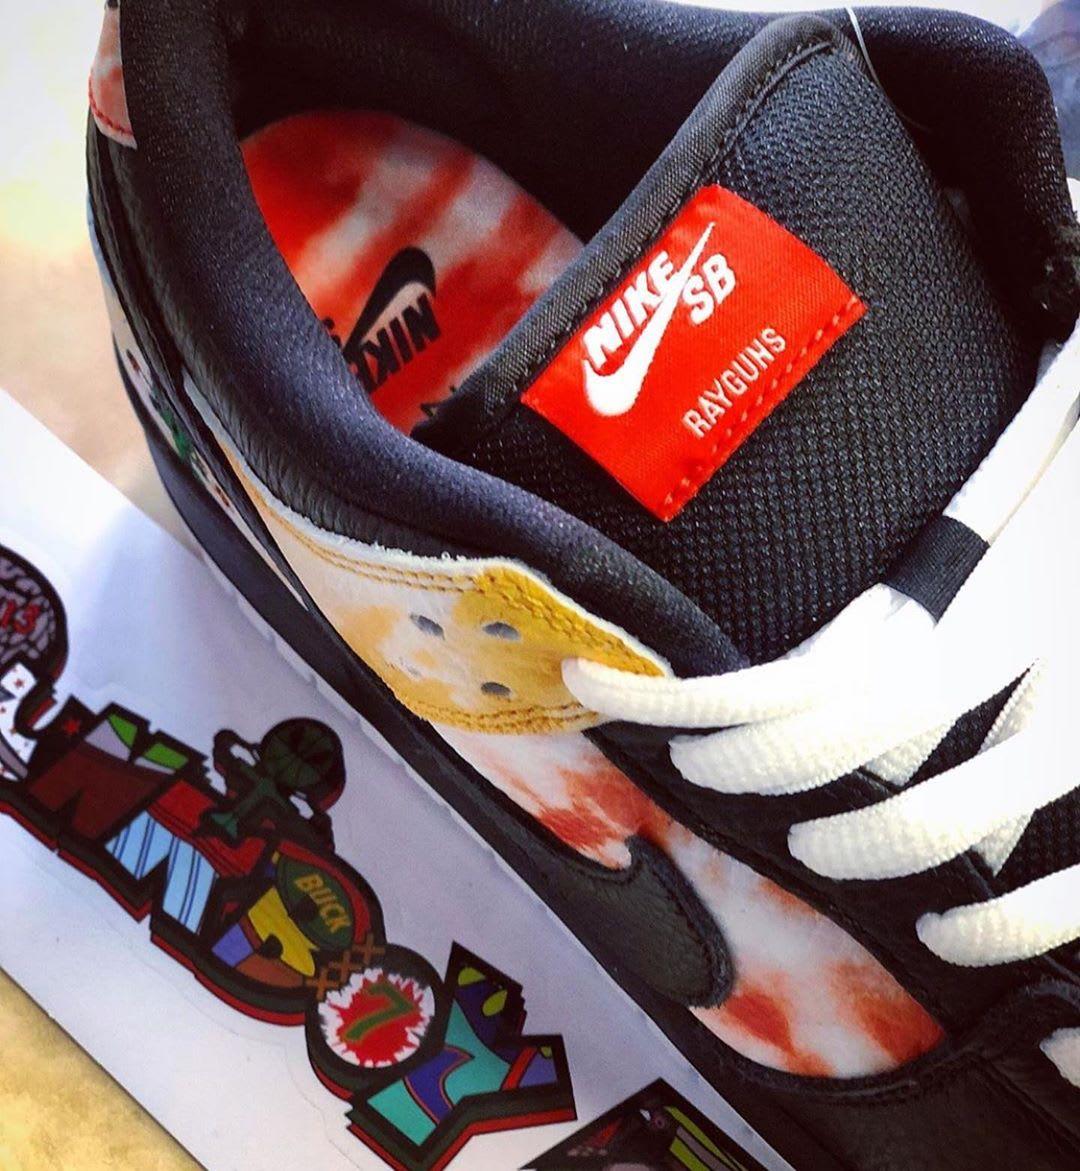 Nike SB Dunk Low 'Raygun Tie Dye' BQ6832-001 (Detail)